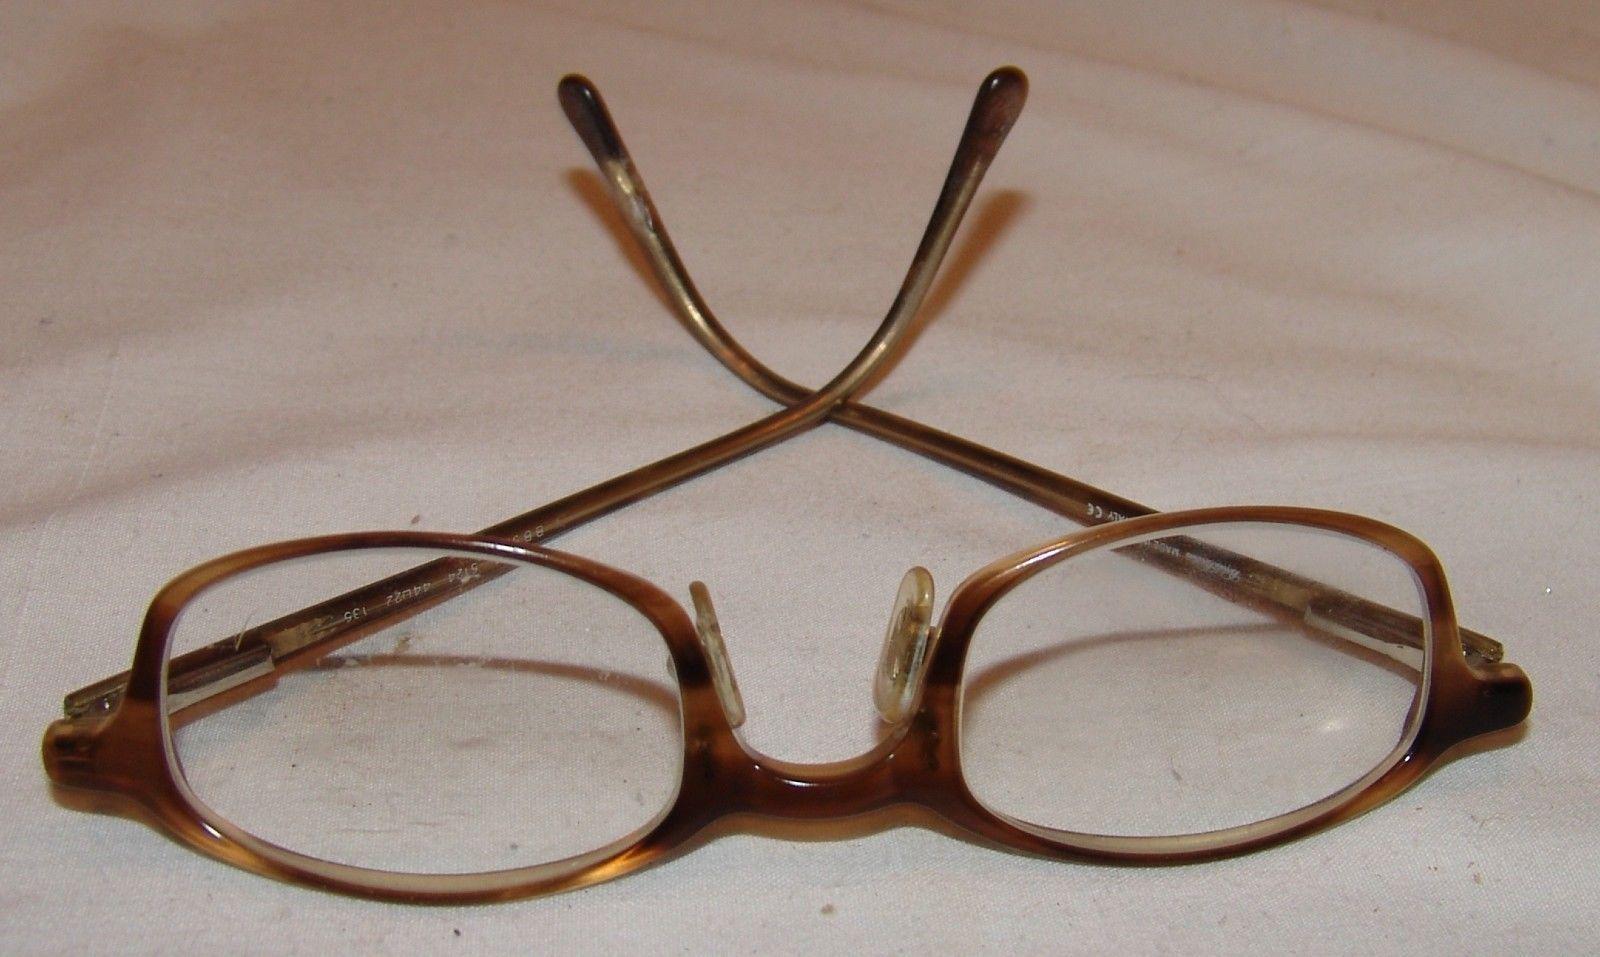 acb8bb0225d Brooks Brothers Eyeglass Frames Glasses BB574 5124 44   22   135 Brown  Italy Men -  27.87